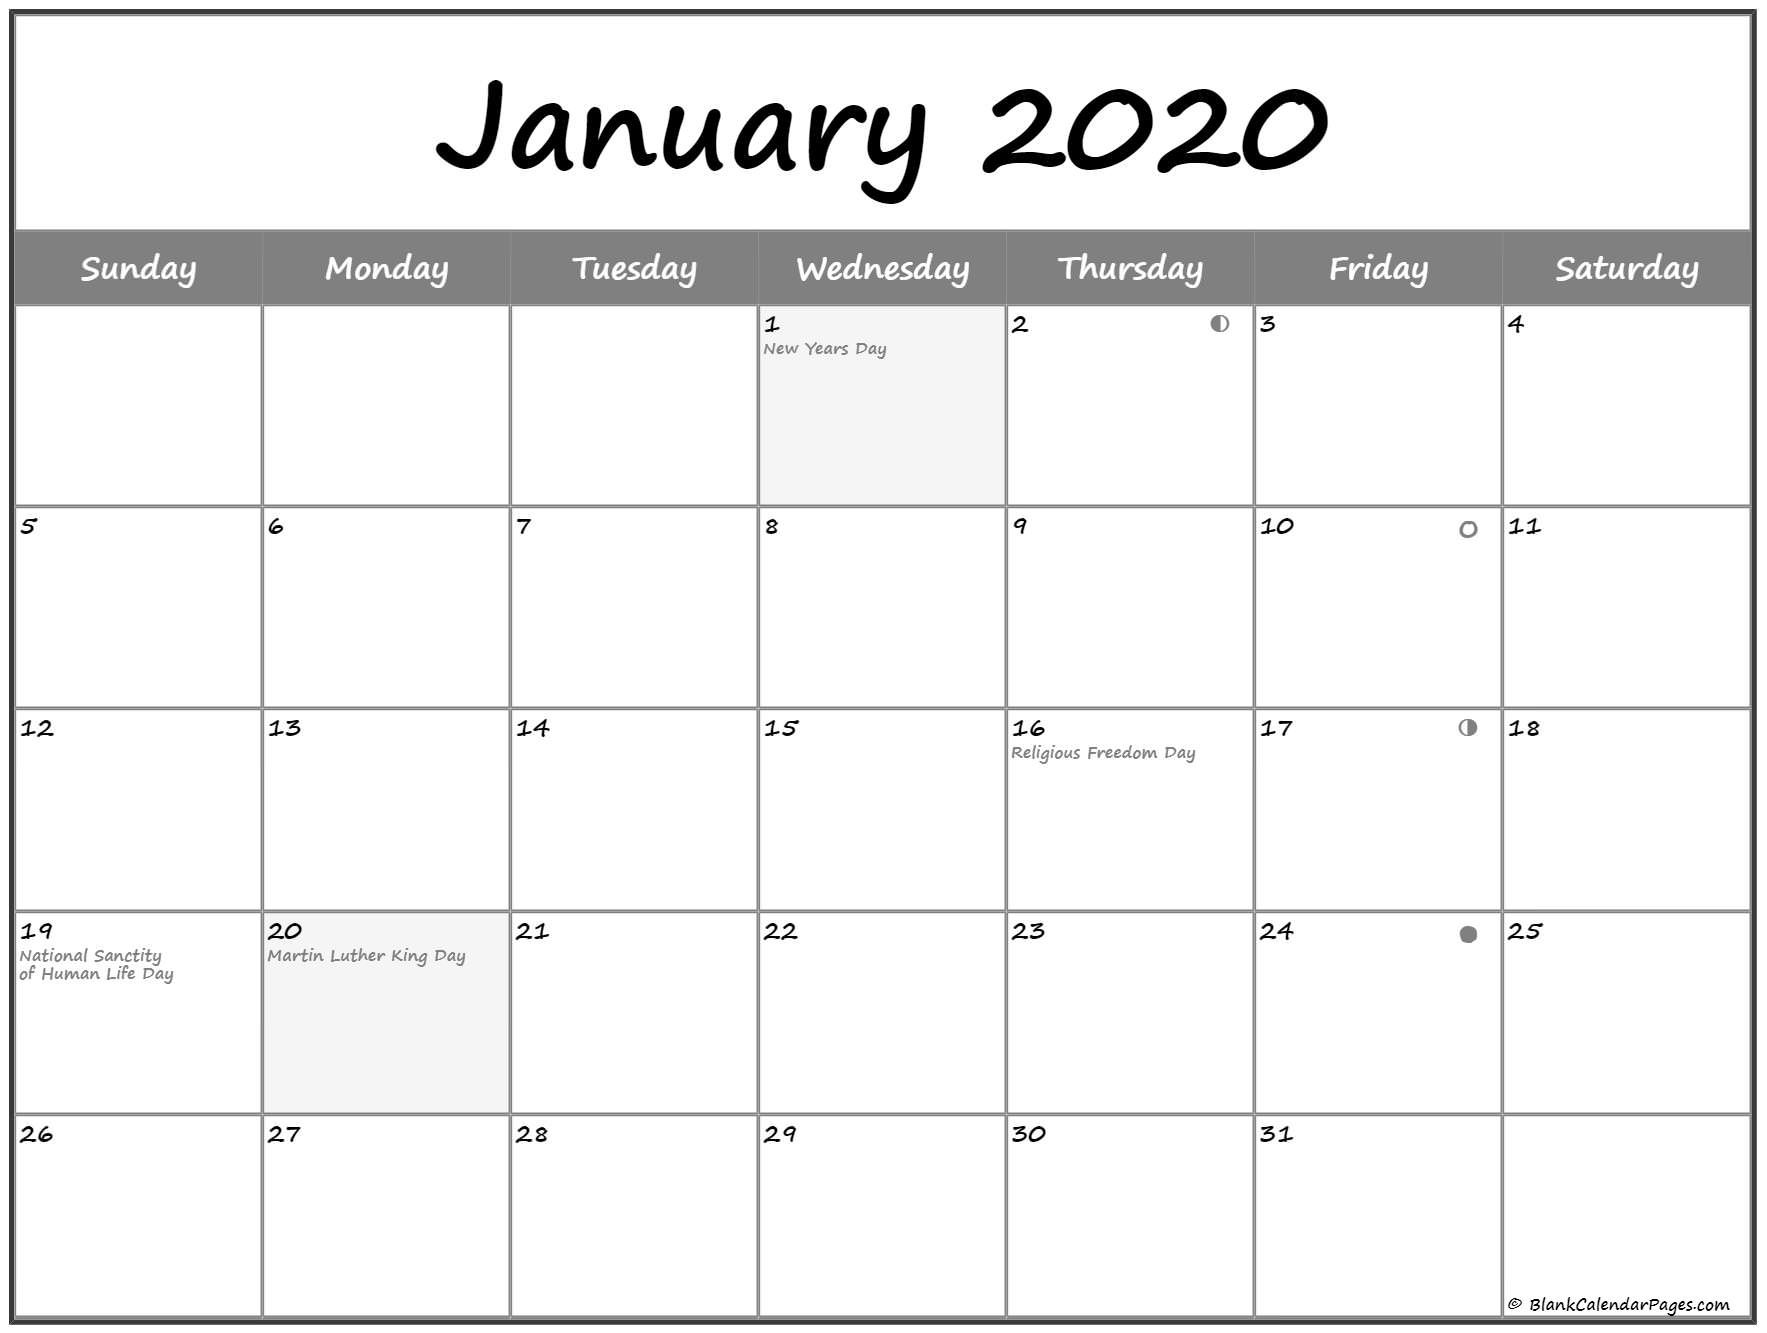 2020 Moon Calendar